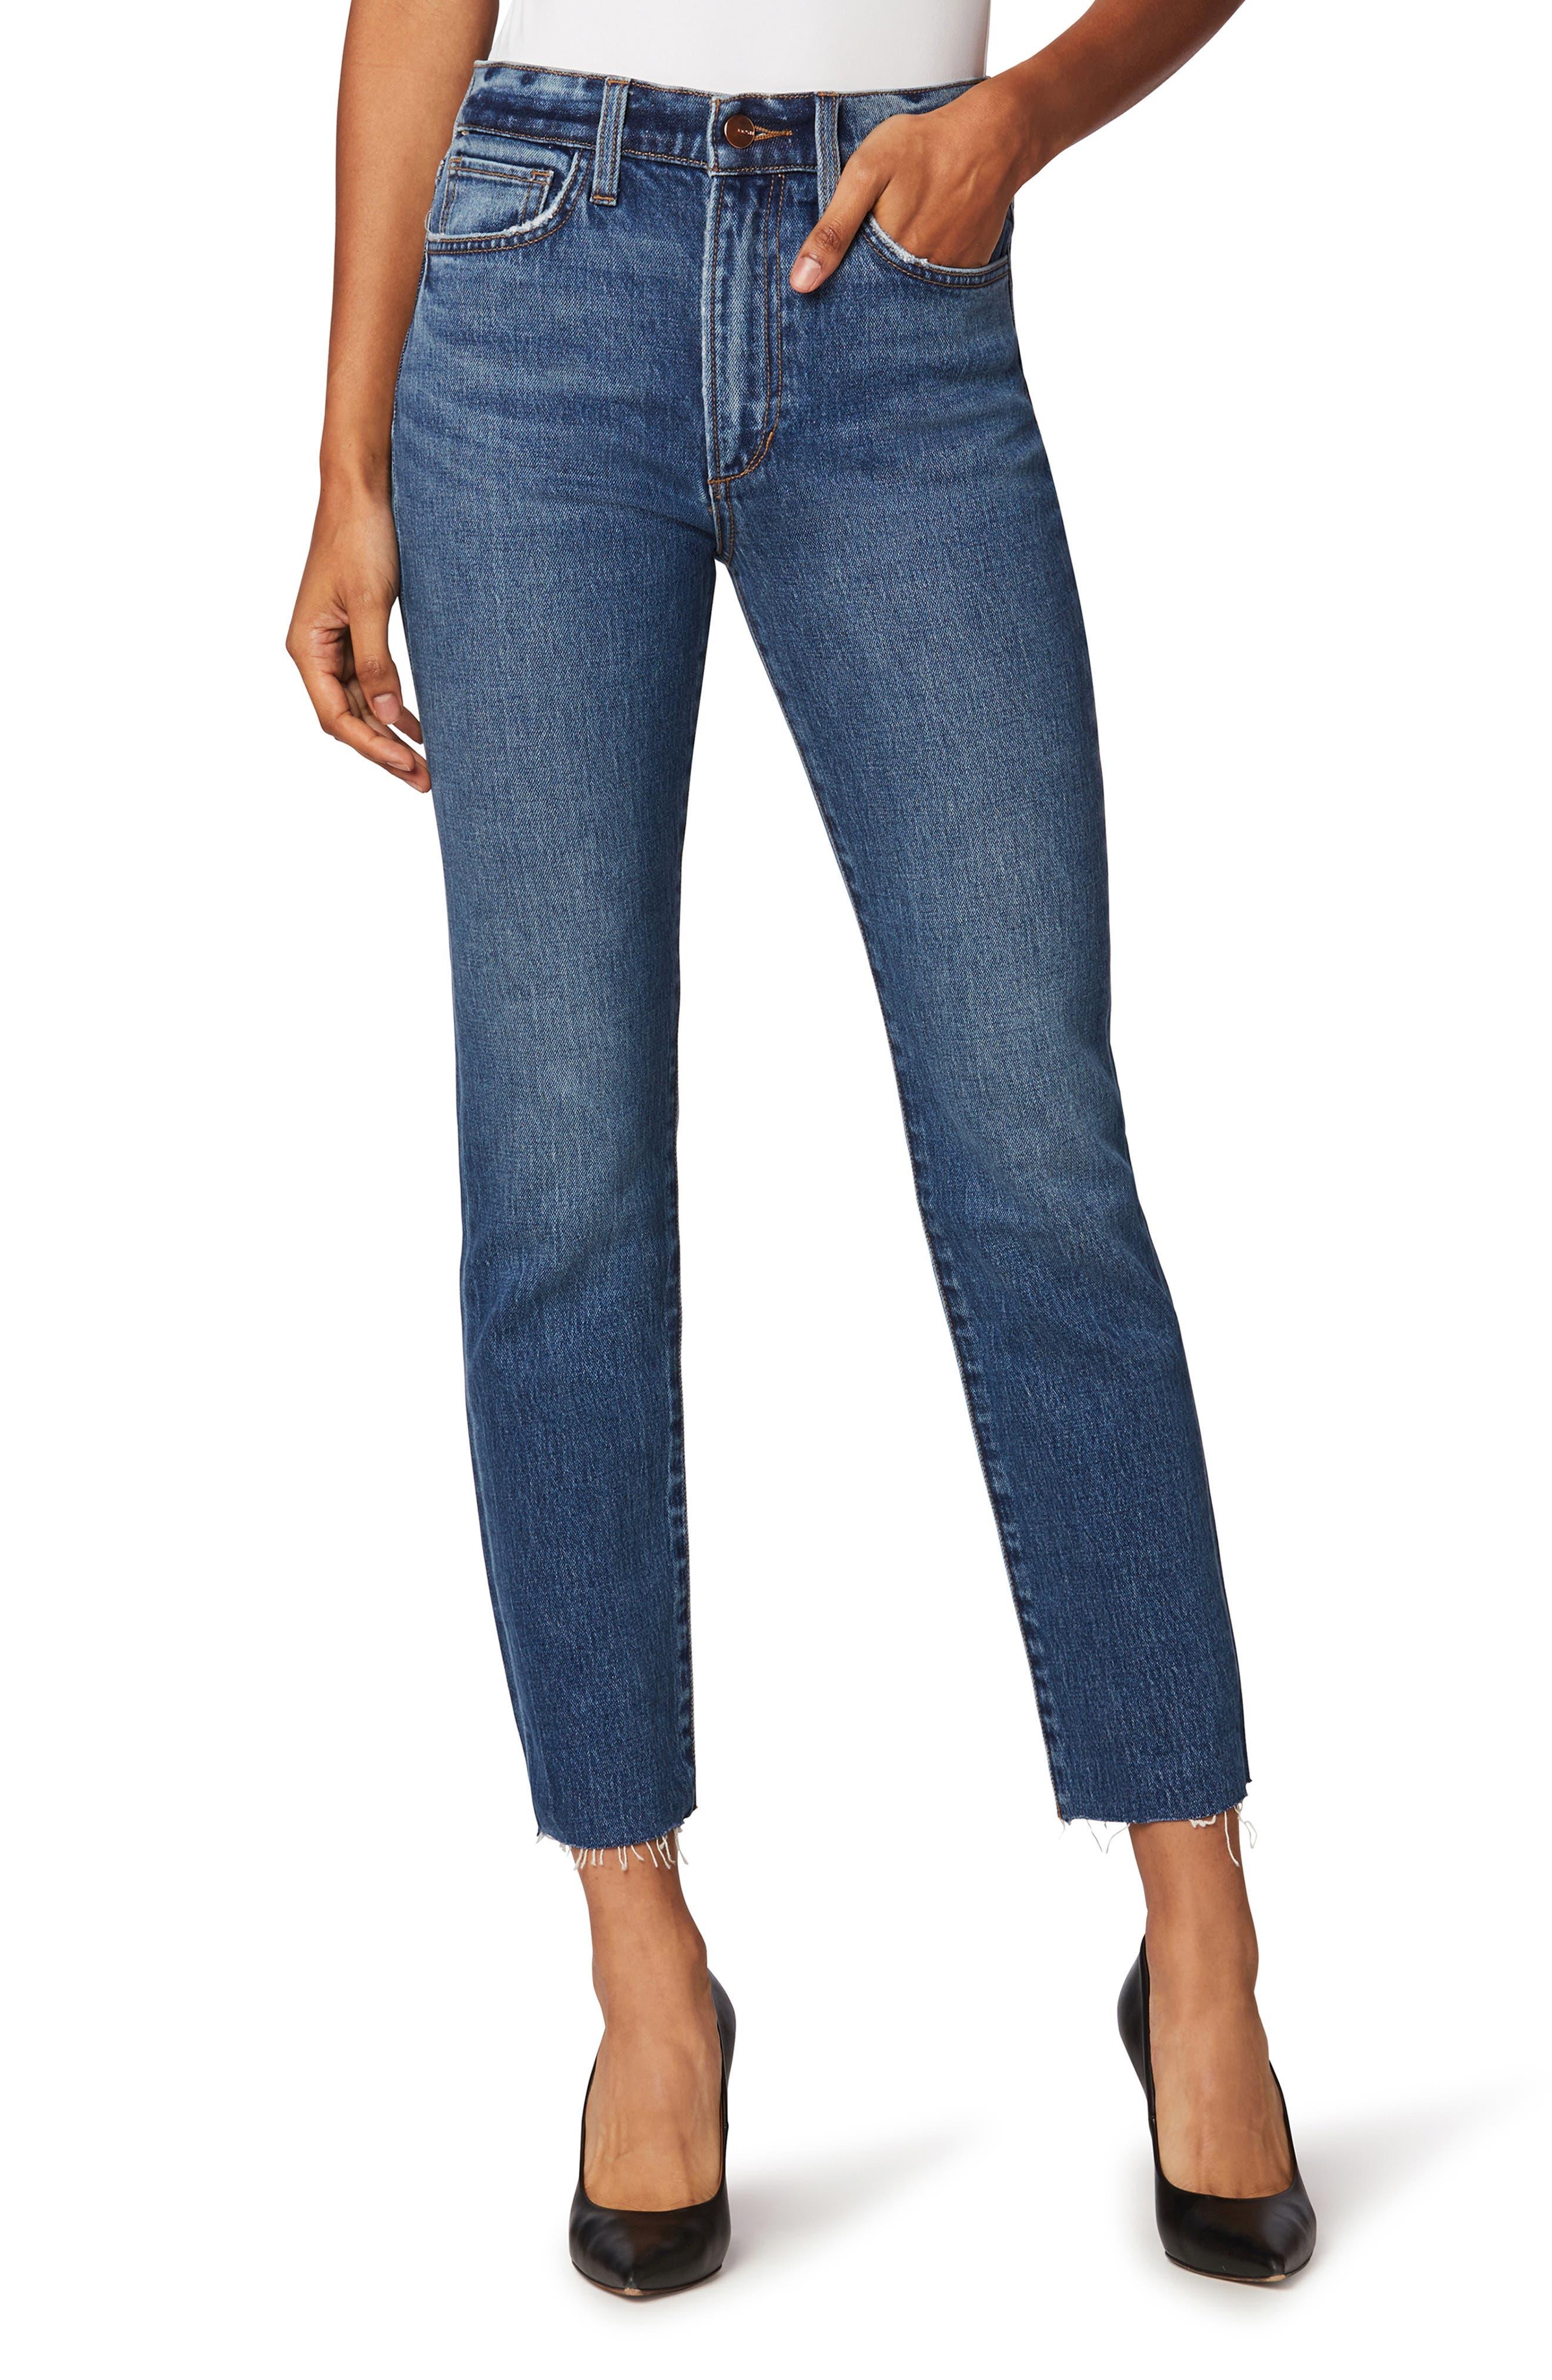 The Luna High Waist Raw Hem Ankle Straight Leg Jeans